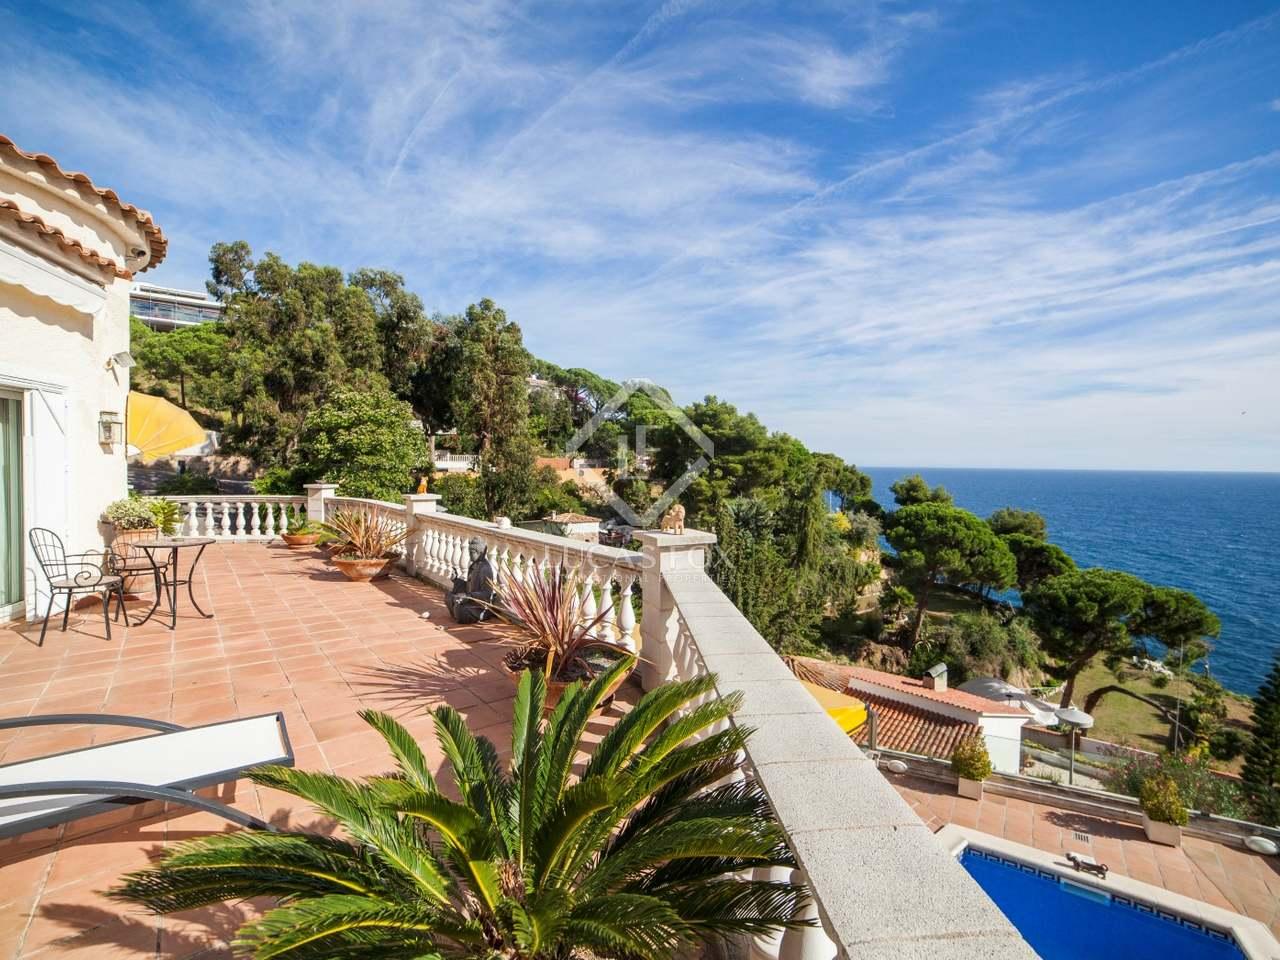 Casa en venta en lloret de mar cerca de barcelona - Casa playa costa brava ...